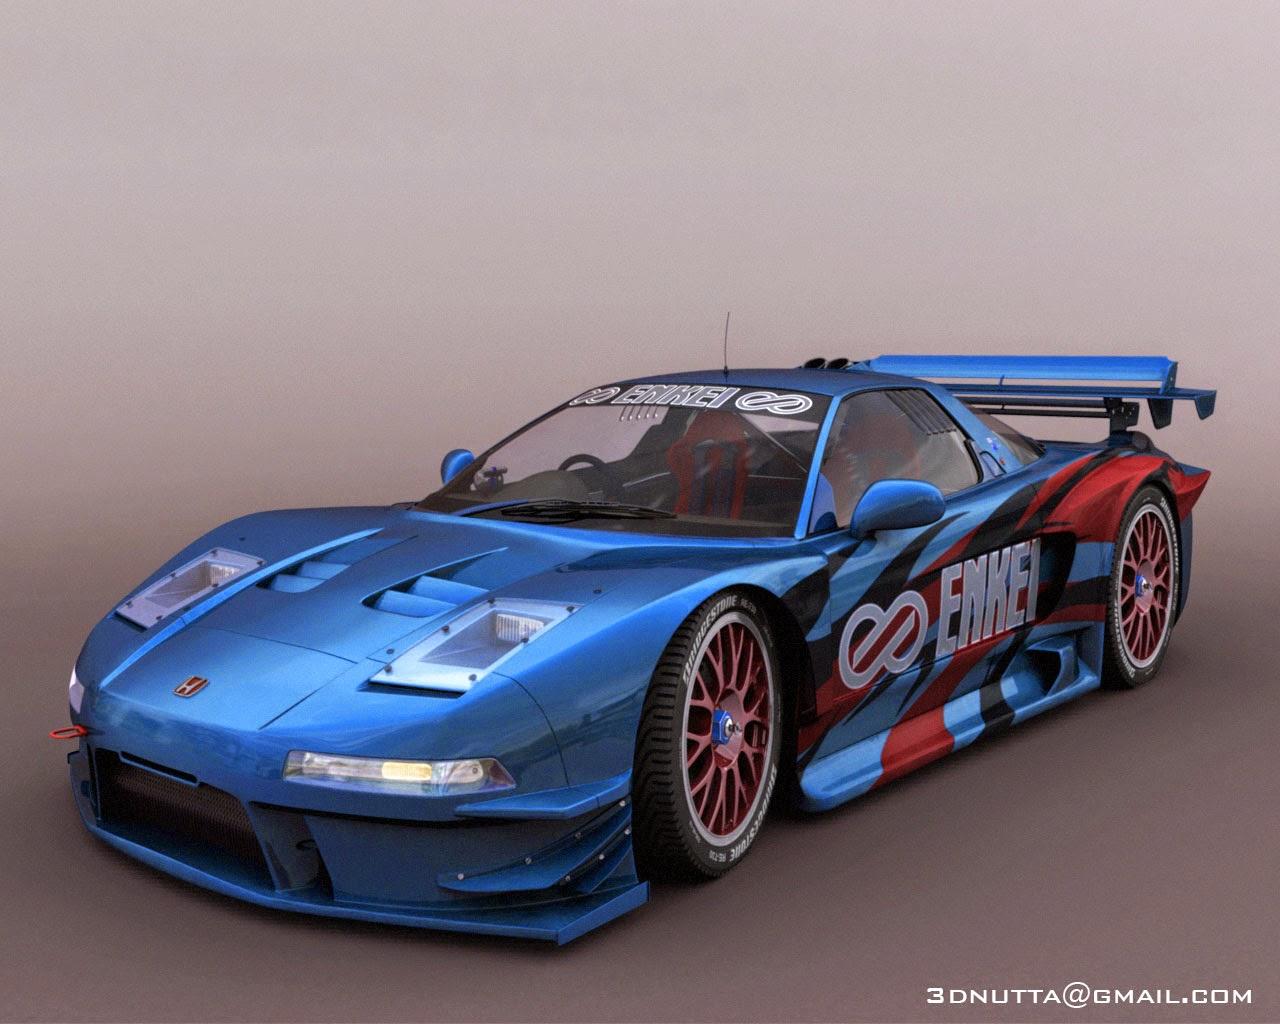 Superman Hd Wallpaper For Iphone 5 10 3d Wallpapers Car Sport Desktop Download Free Best Top